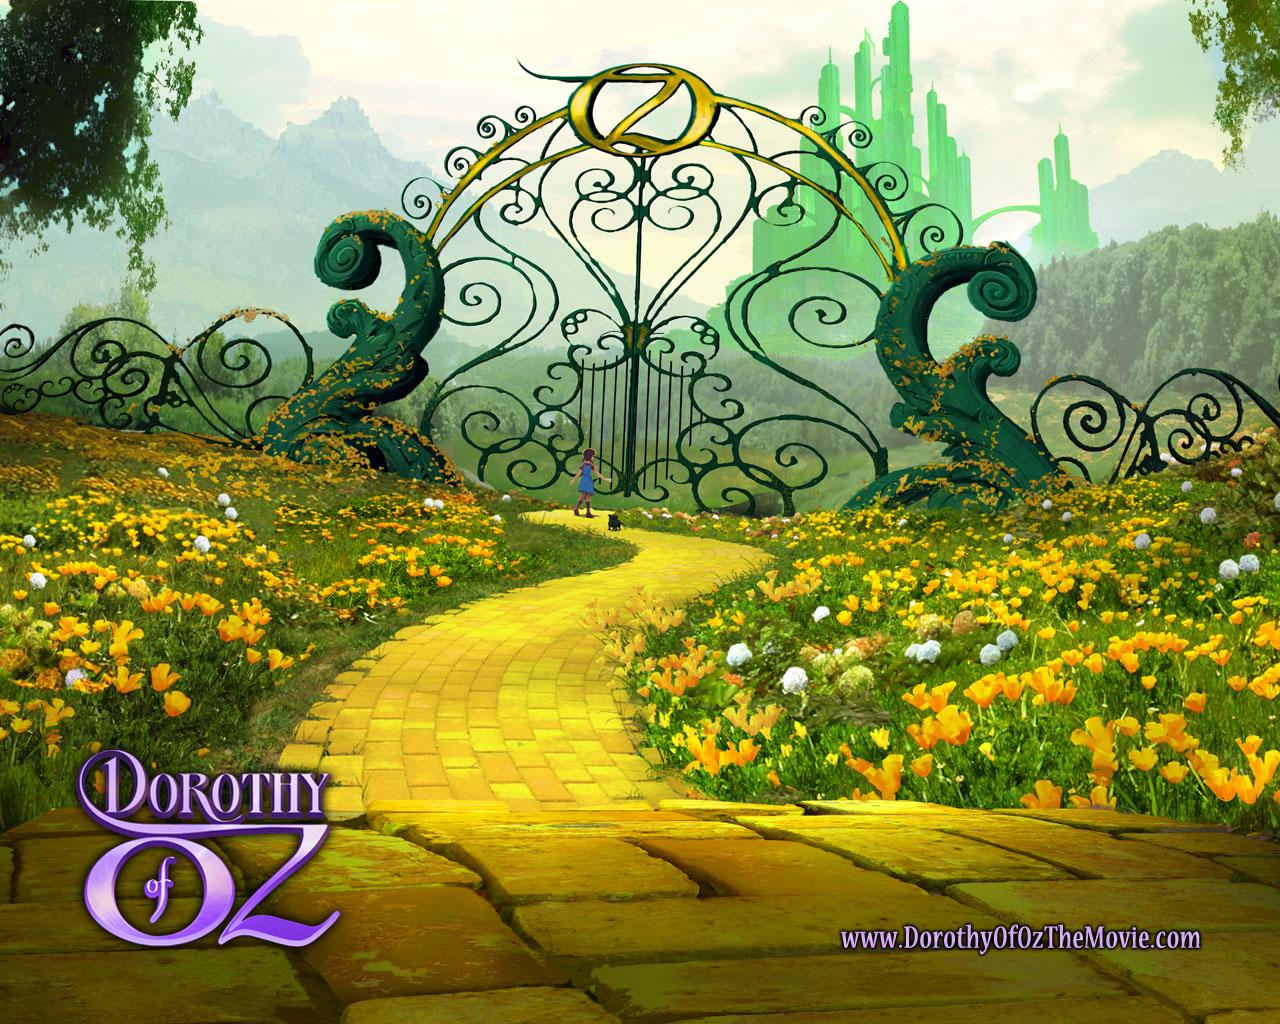 http://st-im.kinopoisk.ru/im/wallpaper/1/5/3/kinopoisk.ru-Legends-of-Oz_3A-Dorothy_27s-Return-1533899--w--1280.jpg